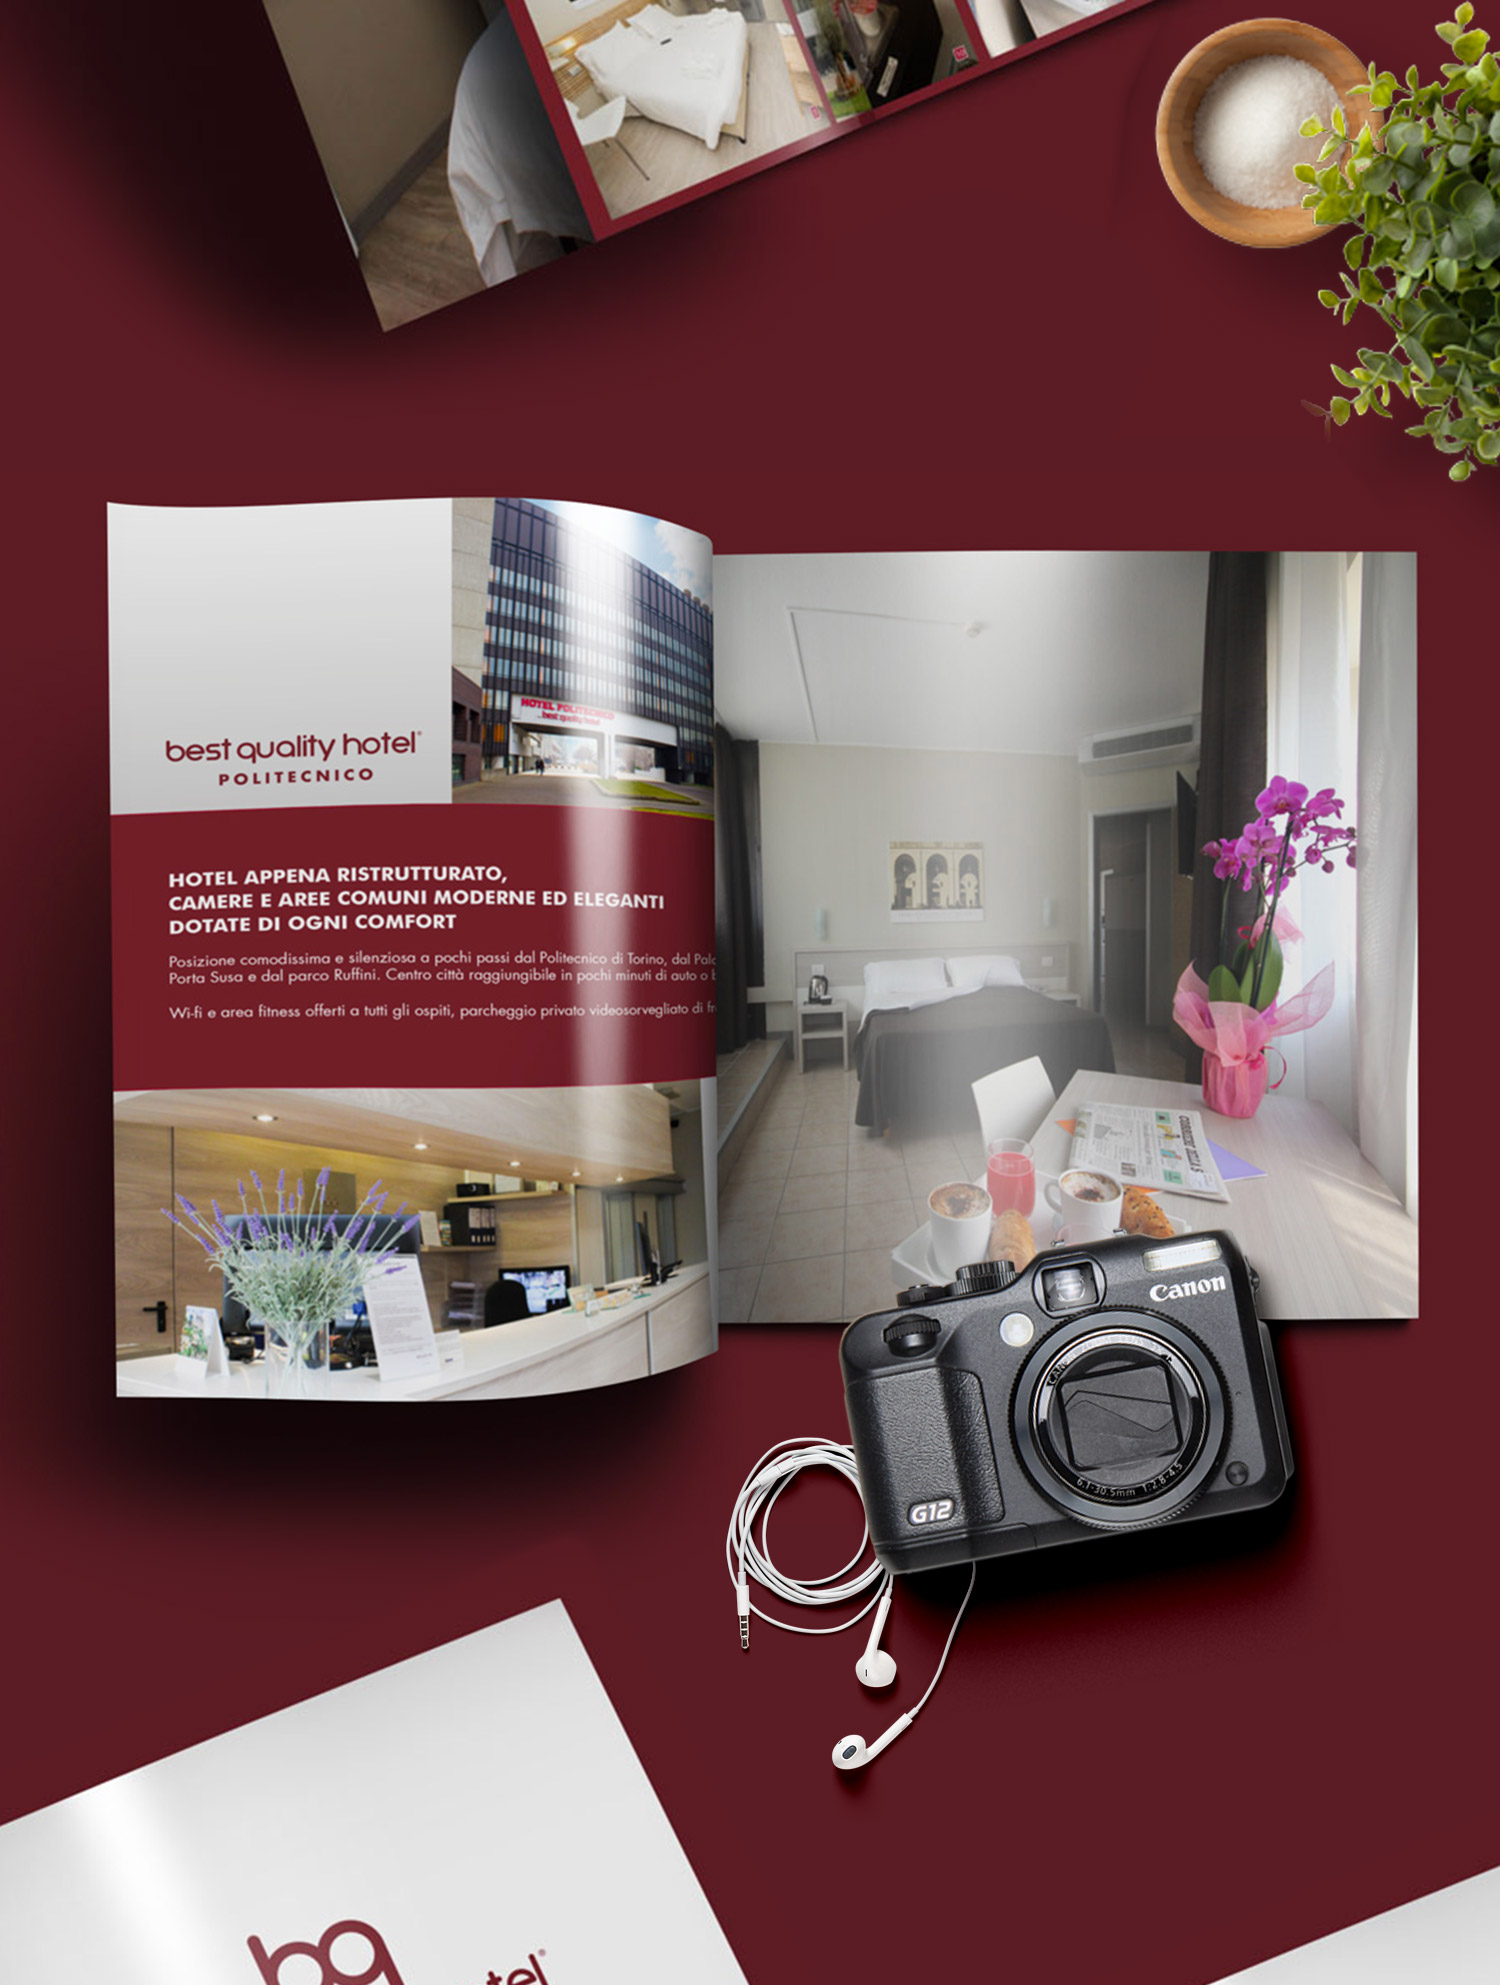 bq-hotel-brochure-02